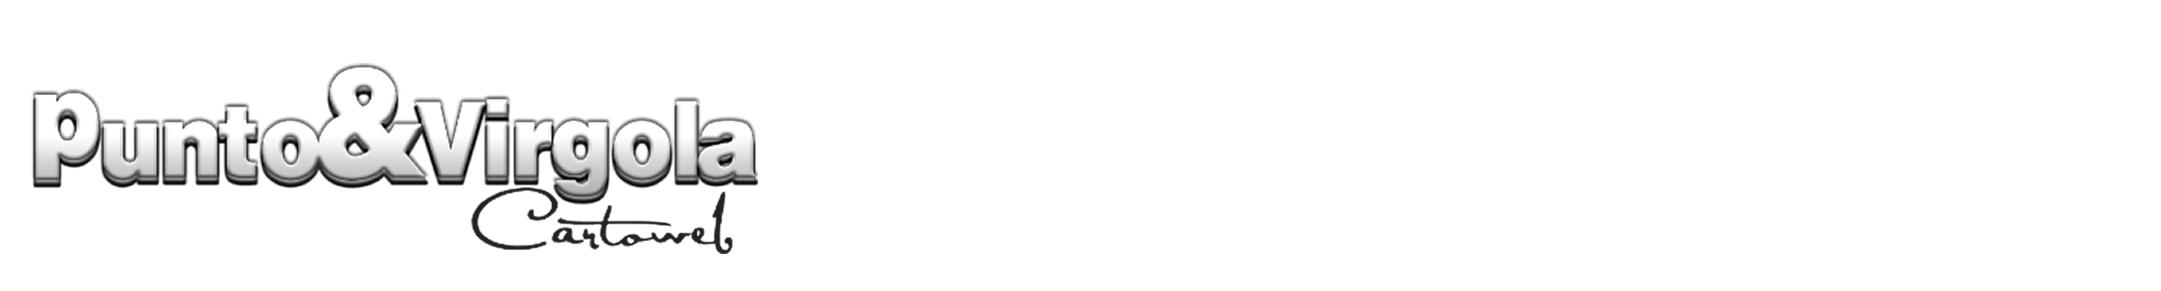 24et/fg Markin 49033 Etichetta adesiva C/547 bianca 100fg A4 105x25mm